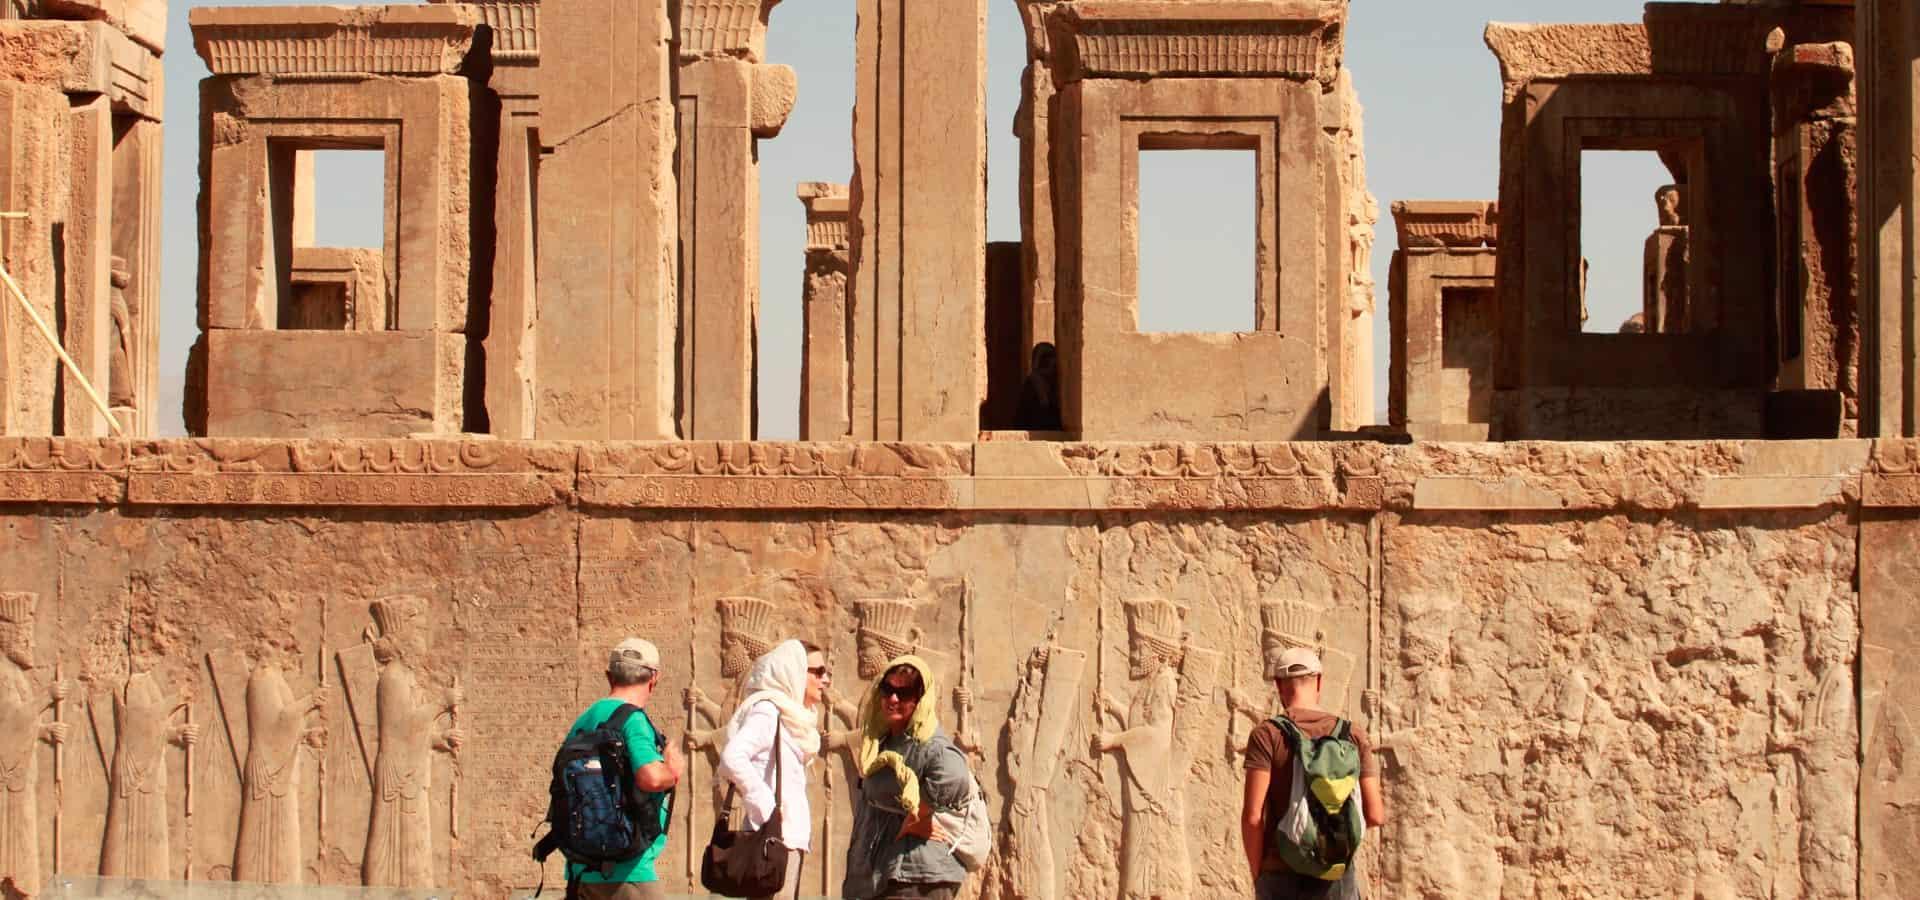 Sightseeing Tour of Persepolis